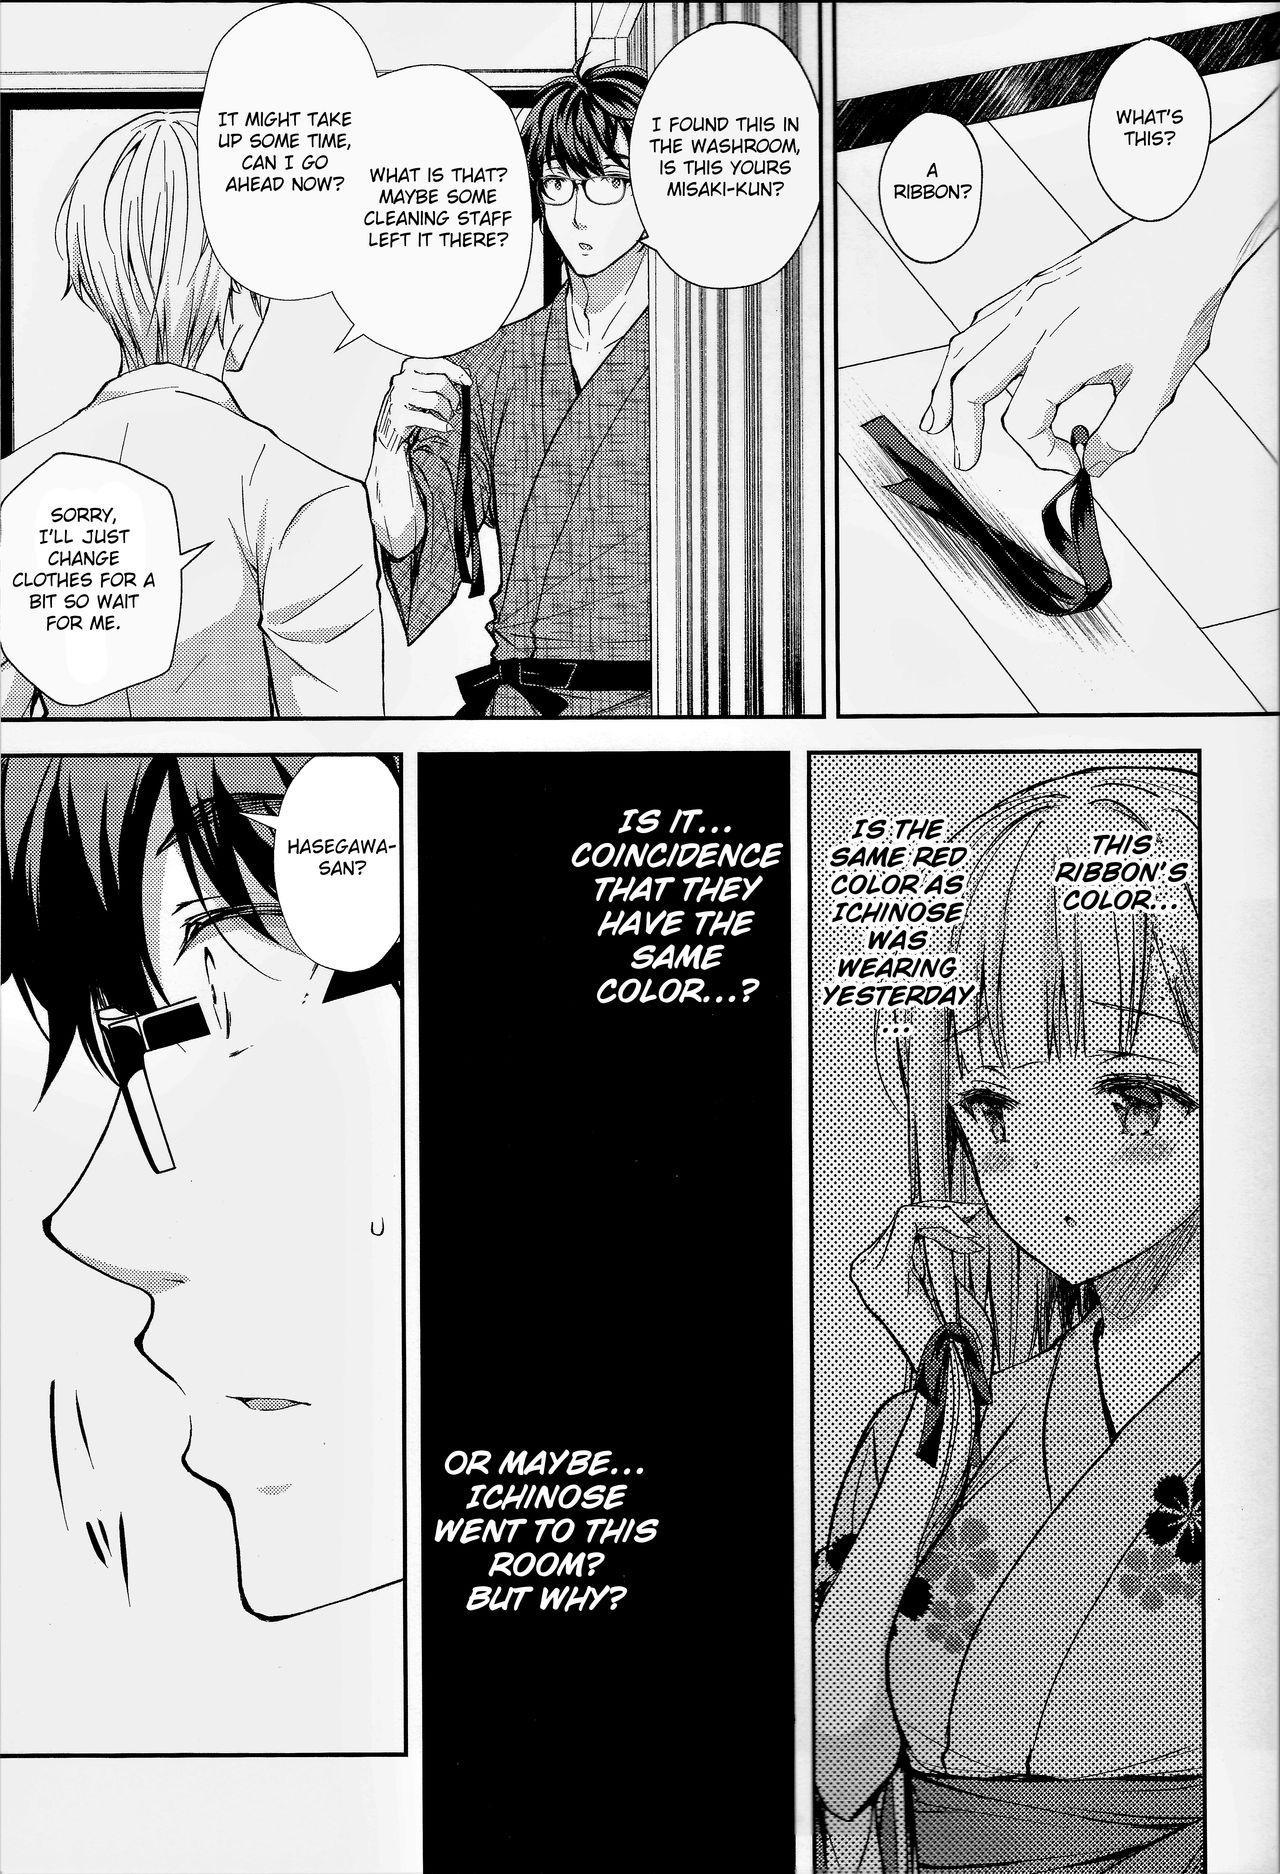 (C97) [Sugar*Berry*Syrup (Crowe)] Indeki no Reijou 4 ~Kare no Tonari de Nureru Insei~   Obscene Lady 4 ~Wet and Moaning Beside My Boyfriend~  [English] [obsoletezero] 39